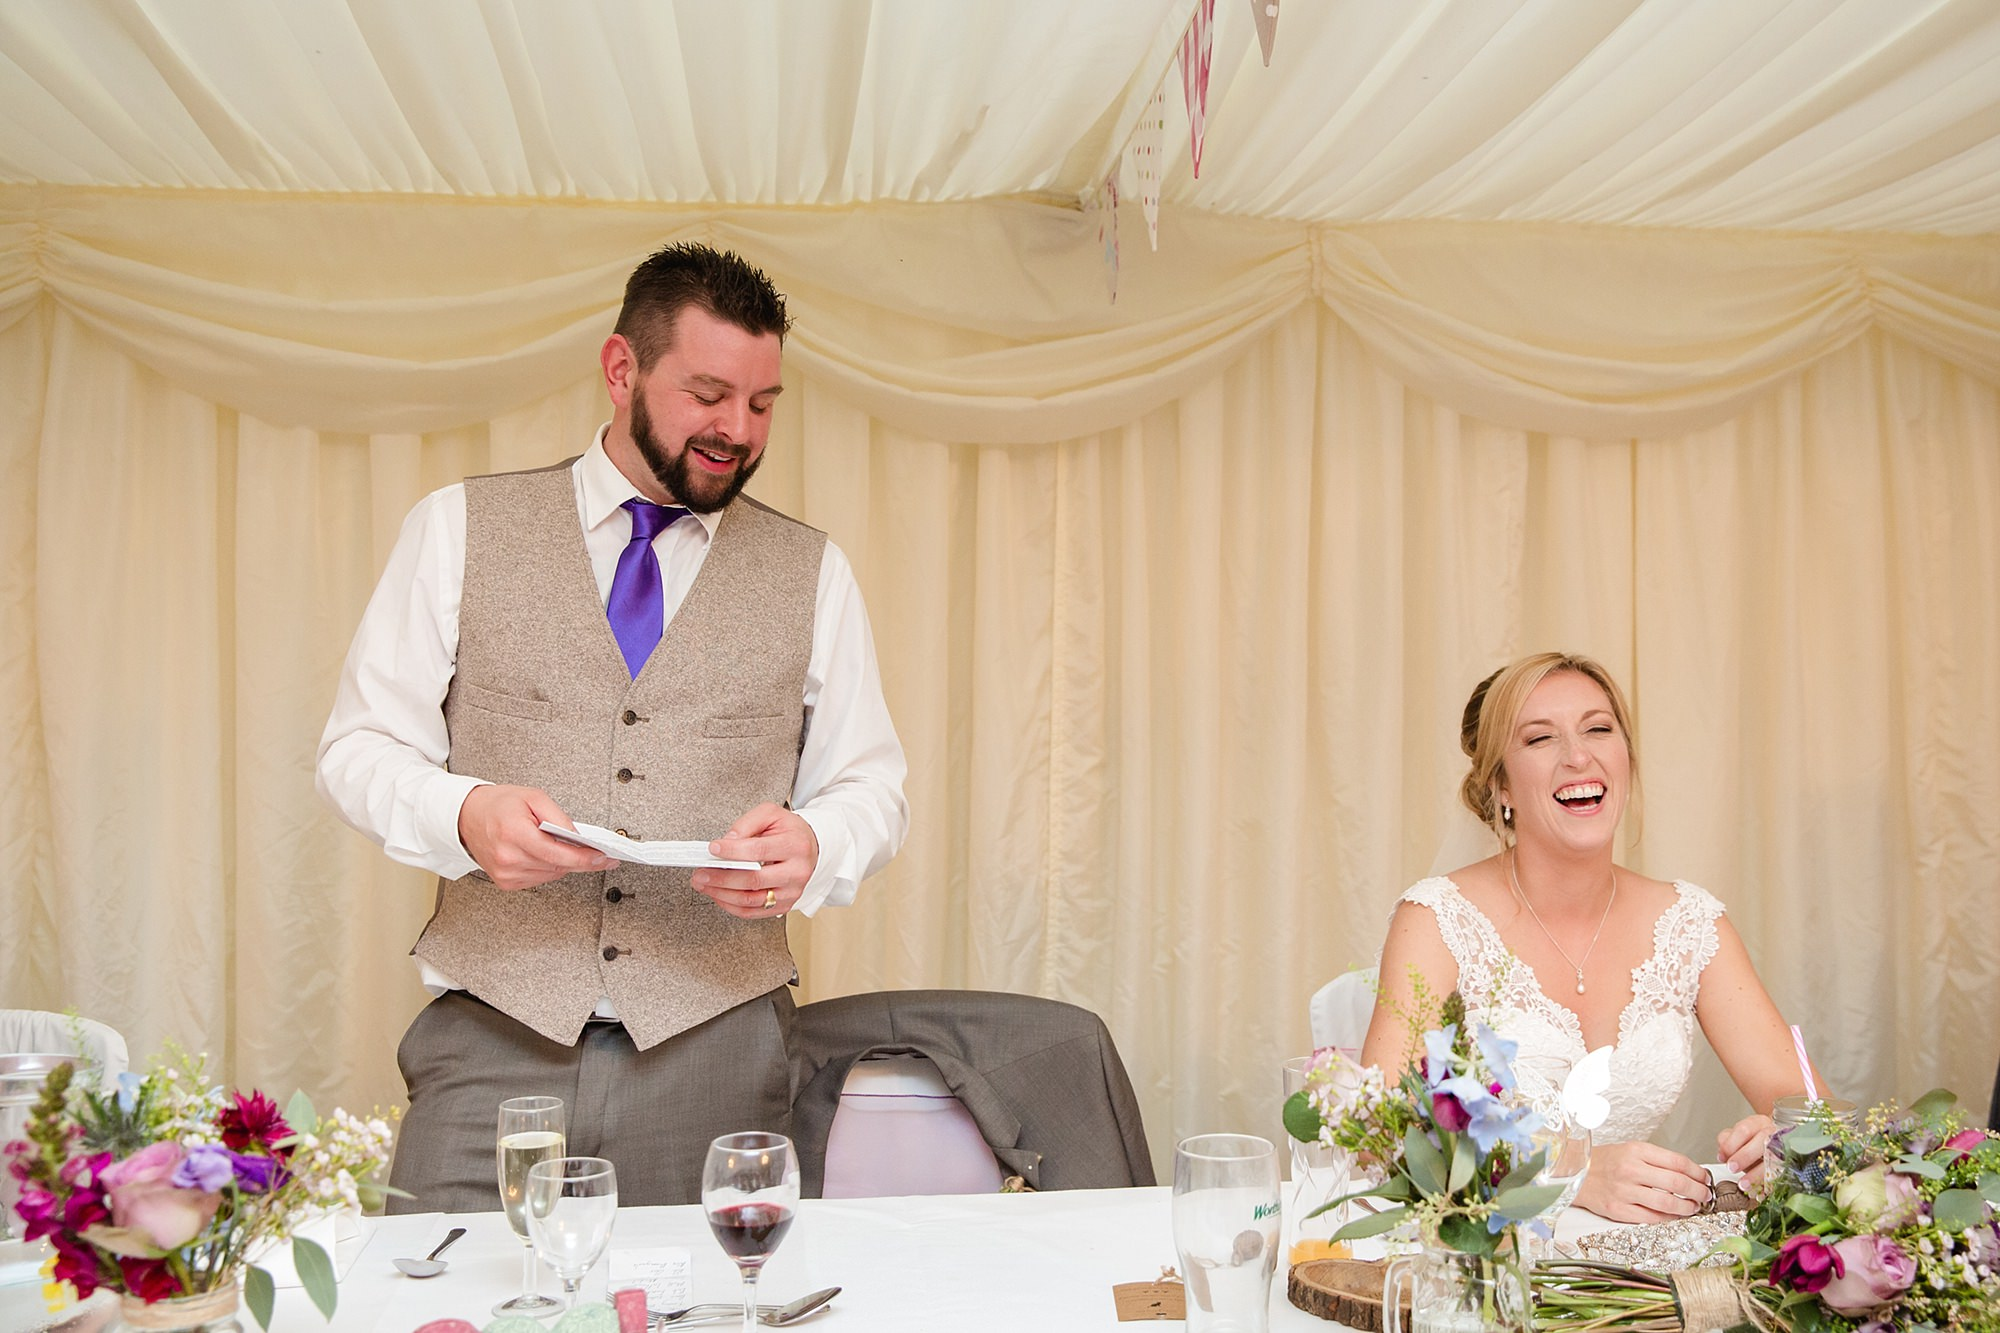 A fun wedding at play Isaf groom's speech